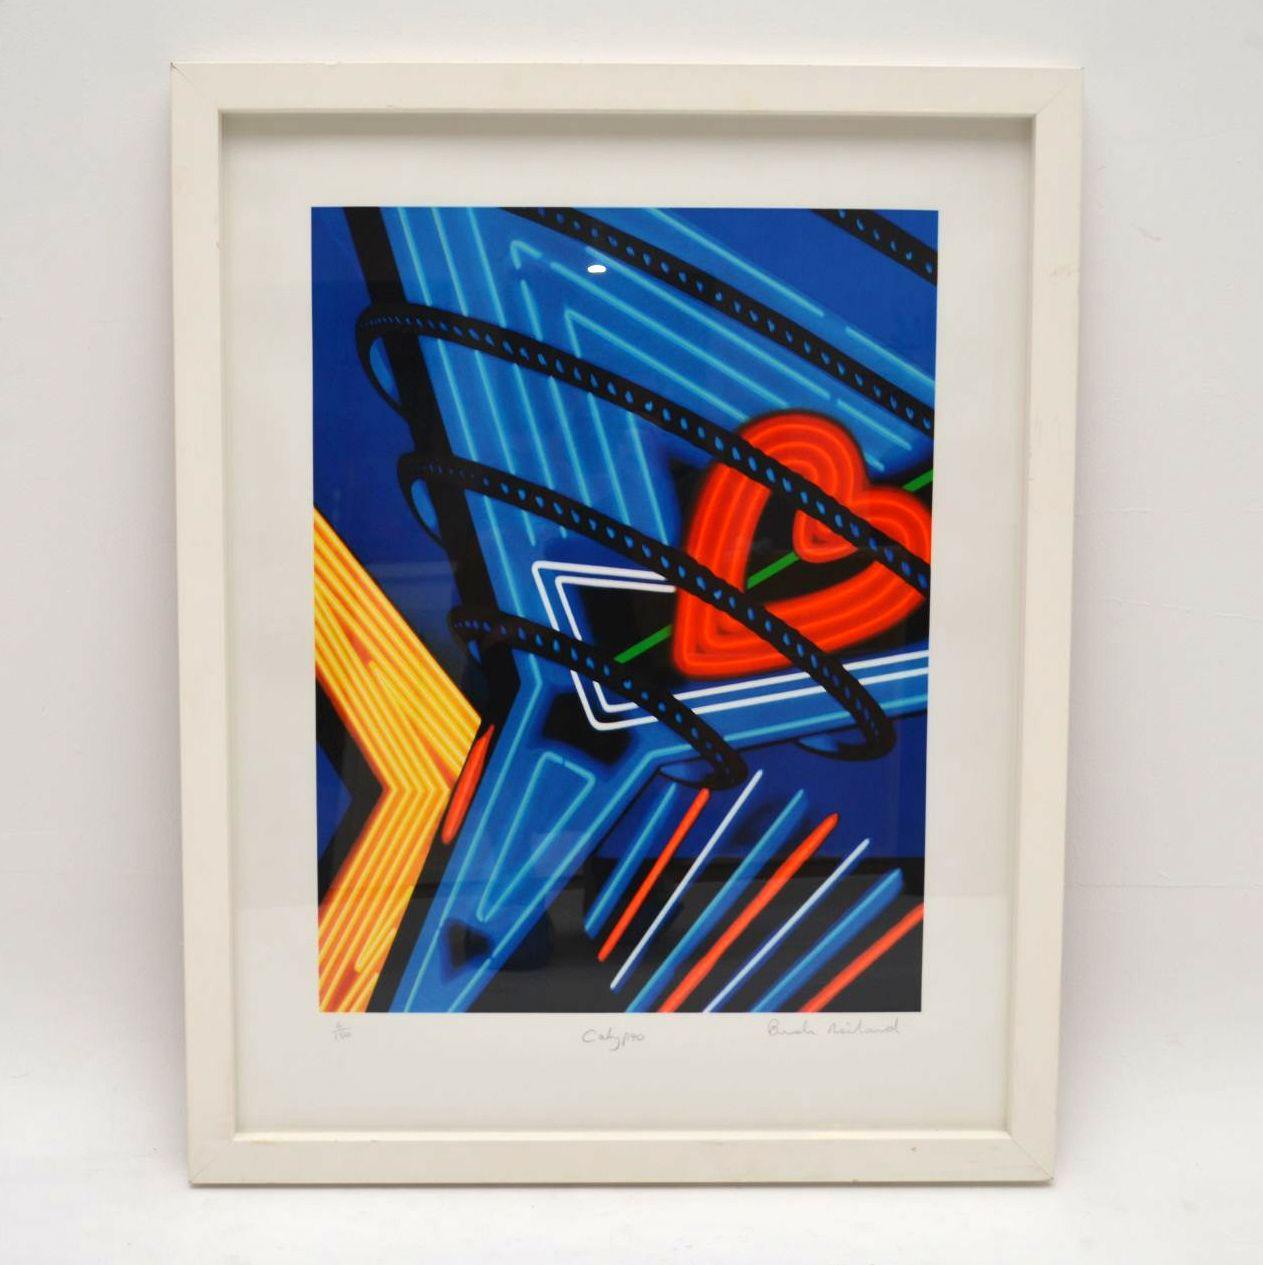 Calyspo - Signed Limited Edition Silkscreen Print by Brendan Neiland 6/150